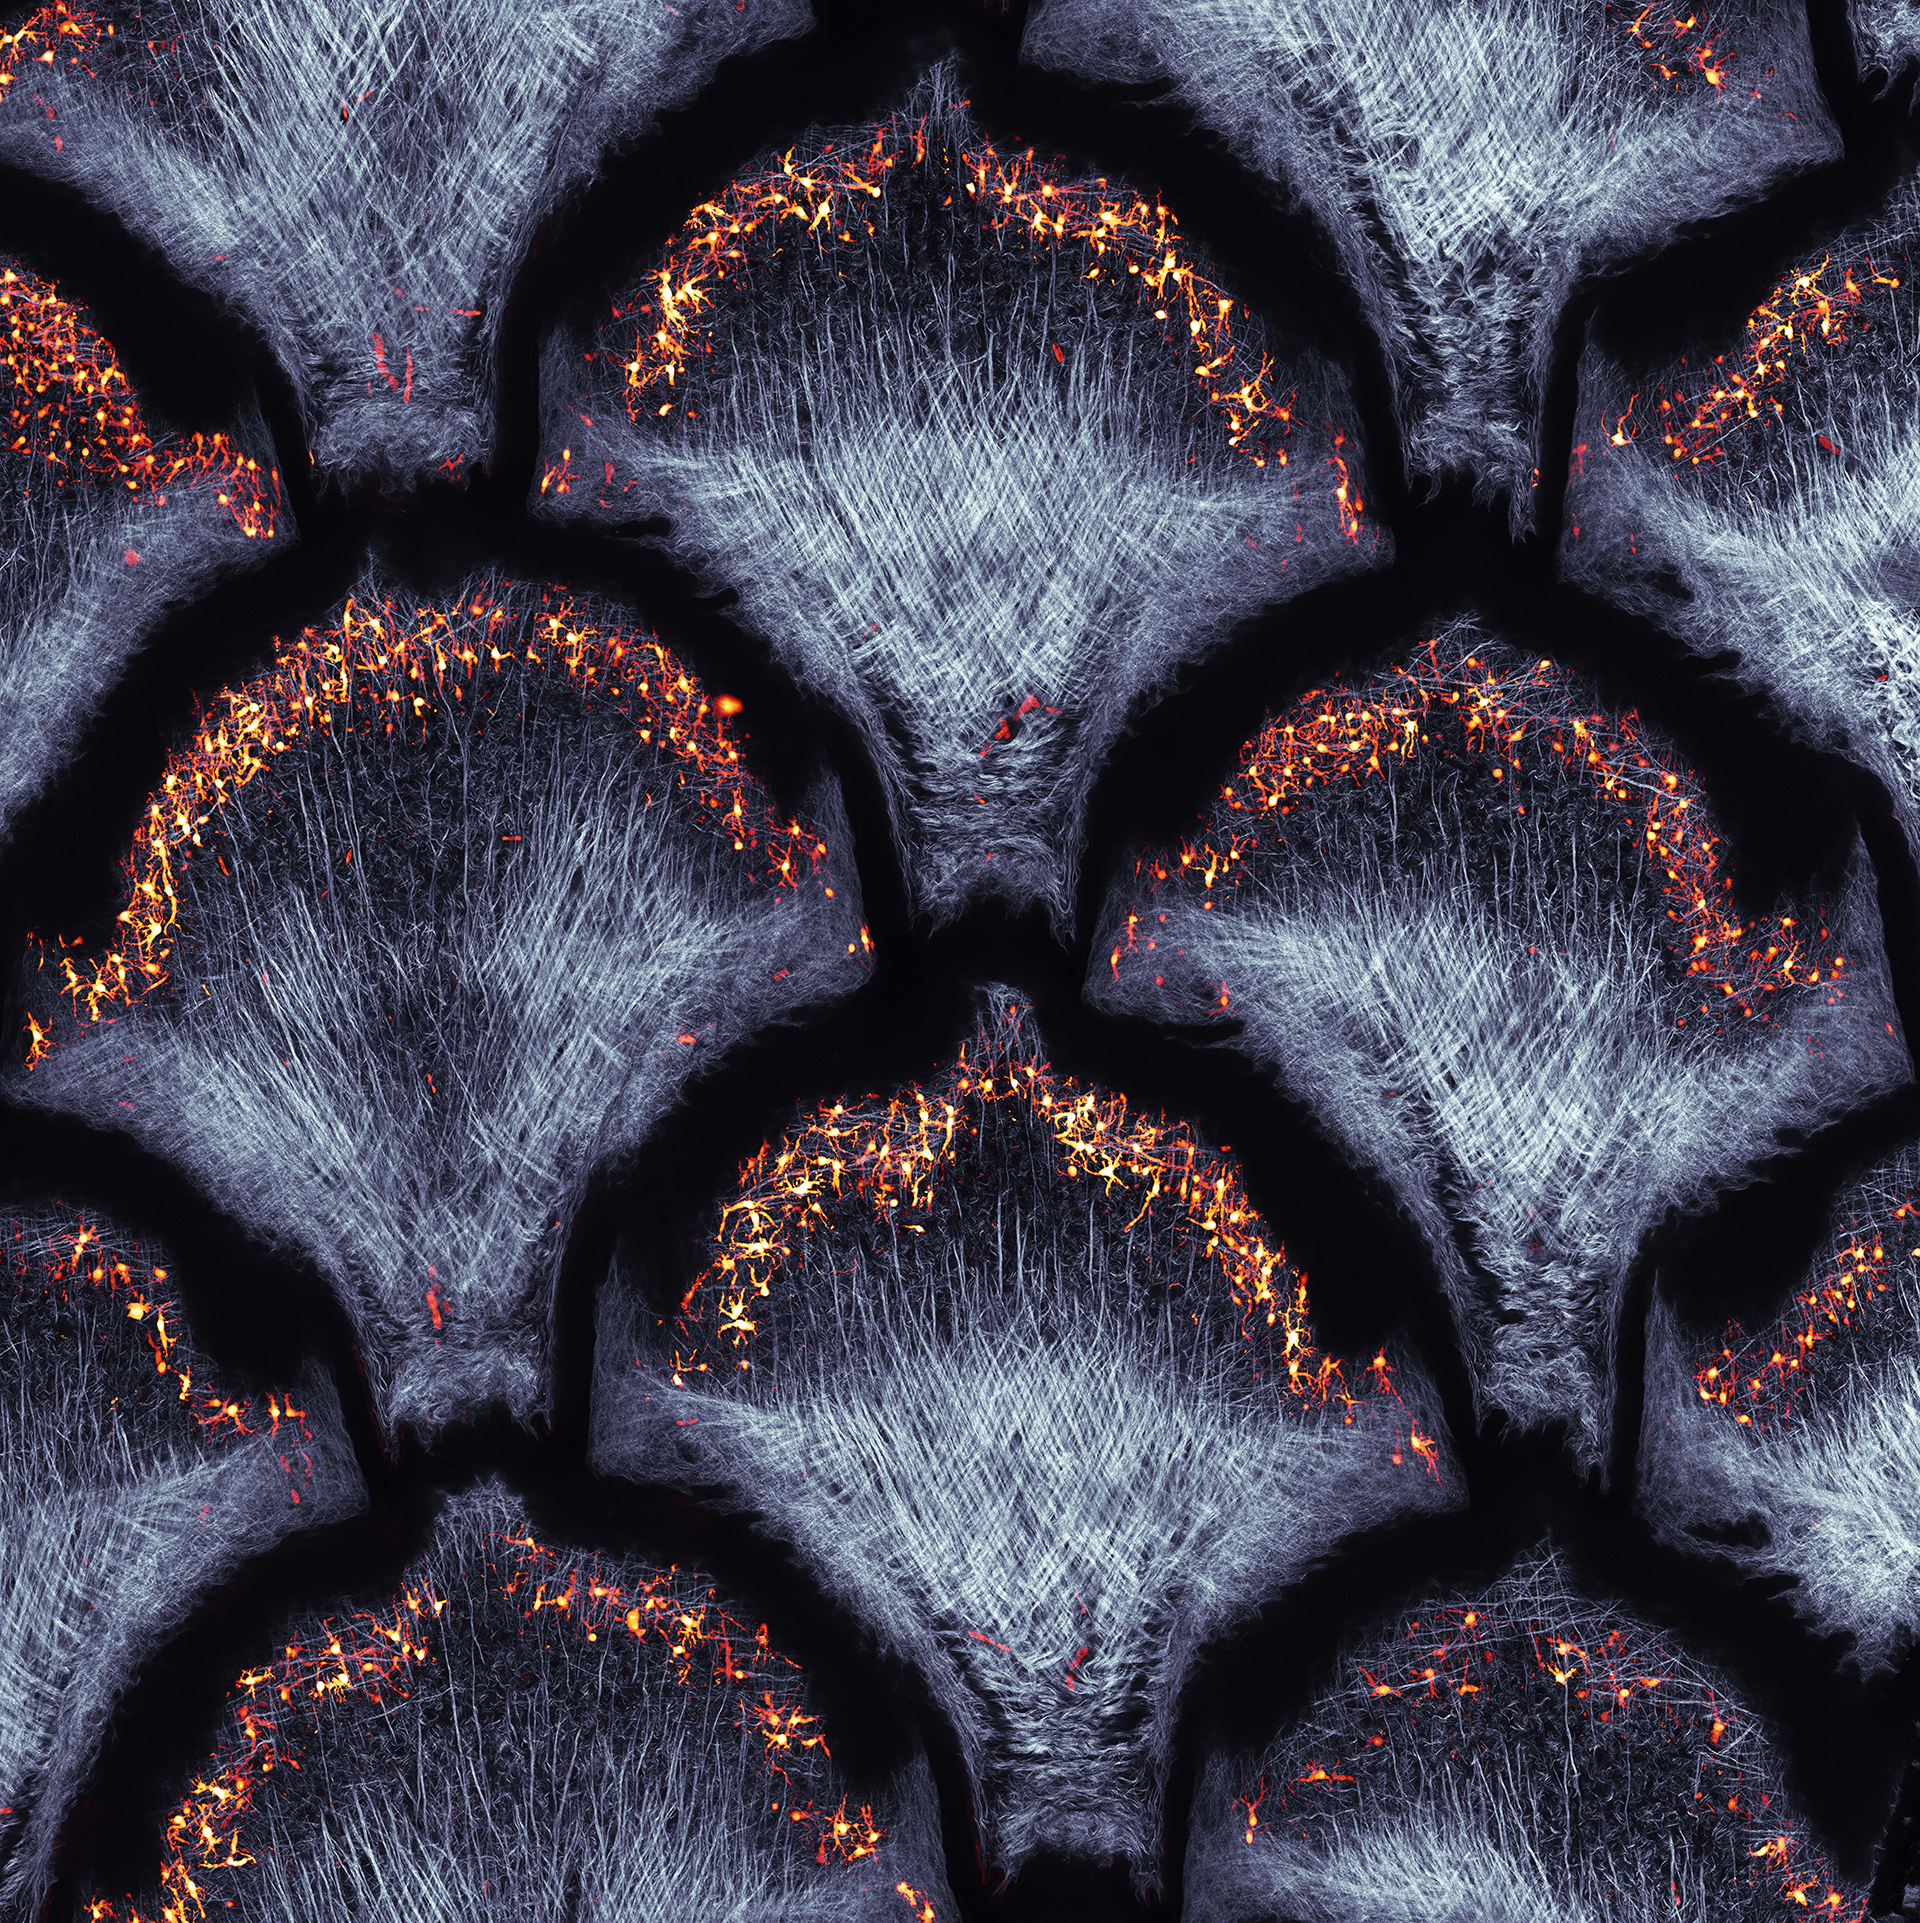 June 2021 - Timin - Collagen fibers and dermal pigment cells